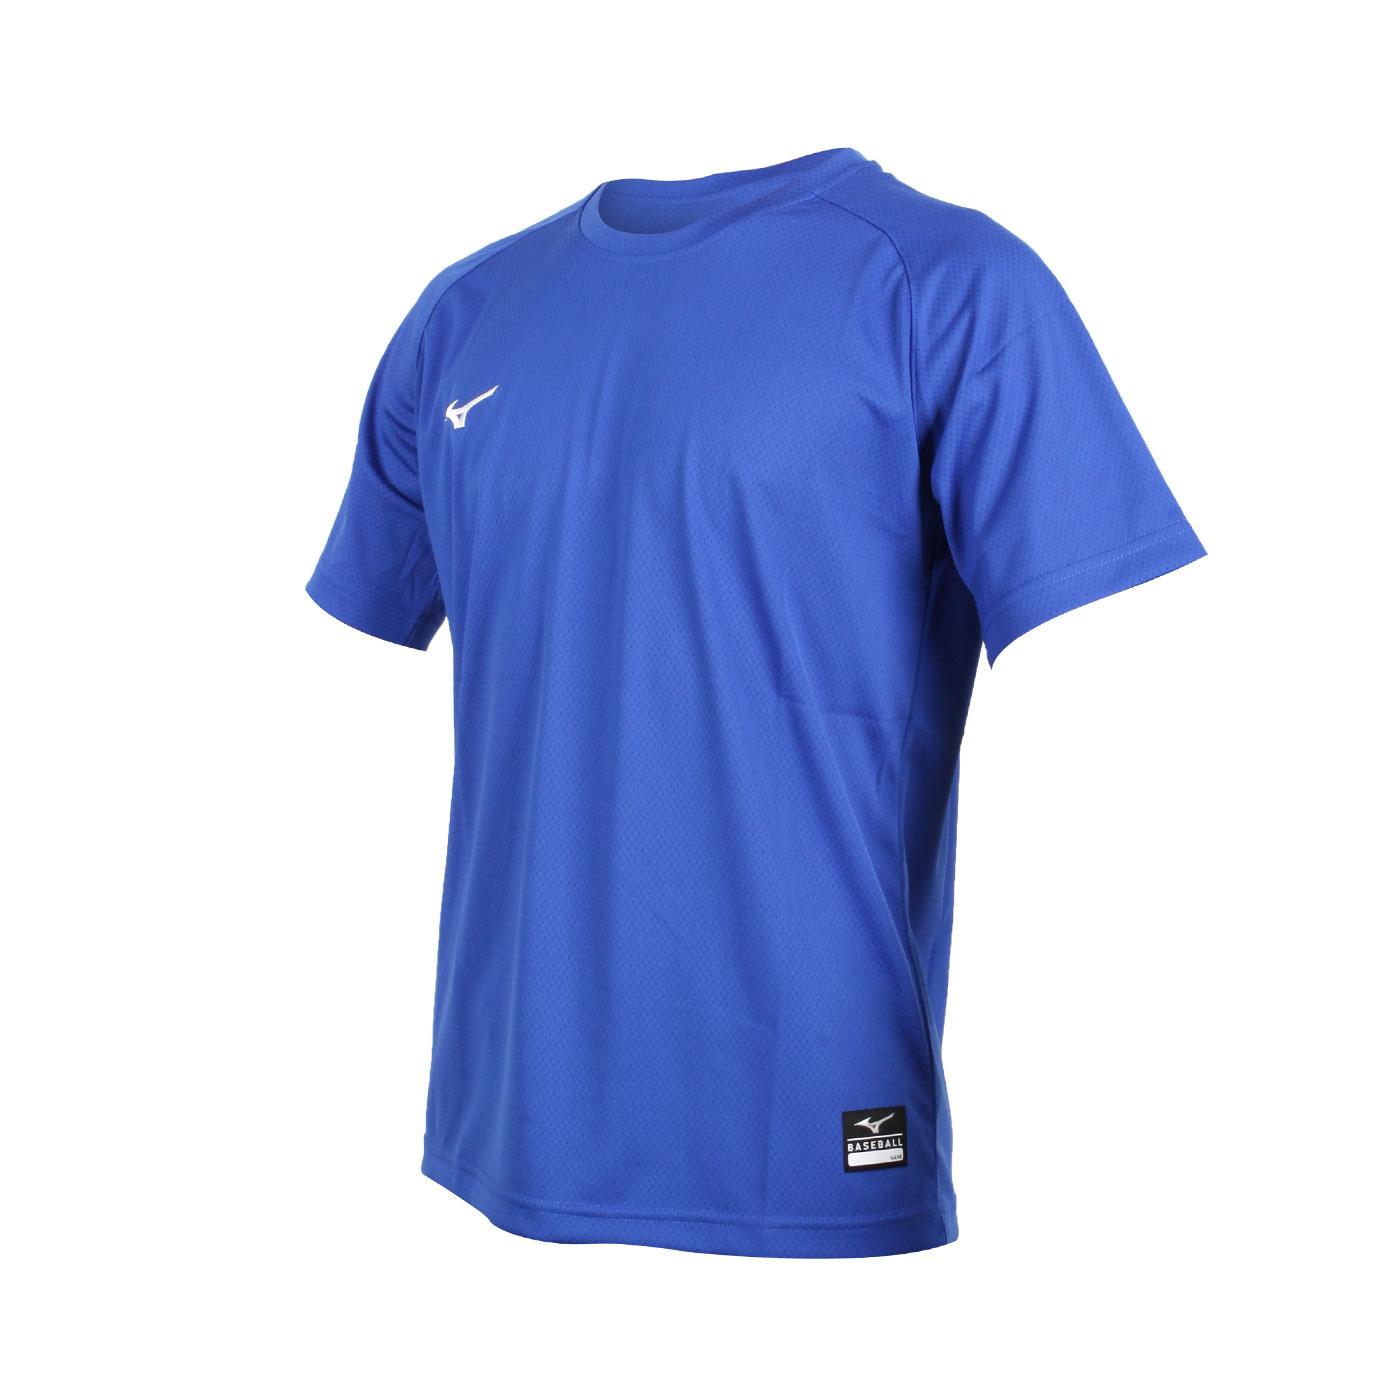 MIZUNO 男款棒球練習短袖T恤 12TC0L1109 - 藍白